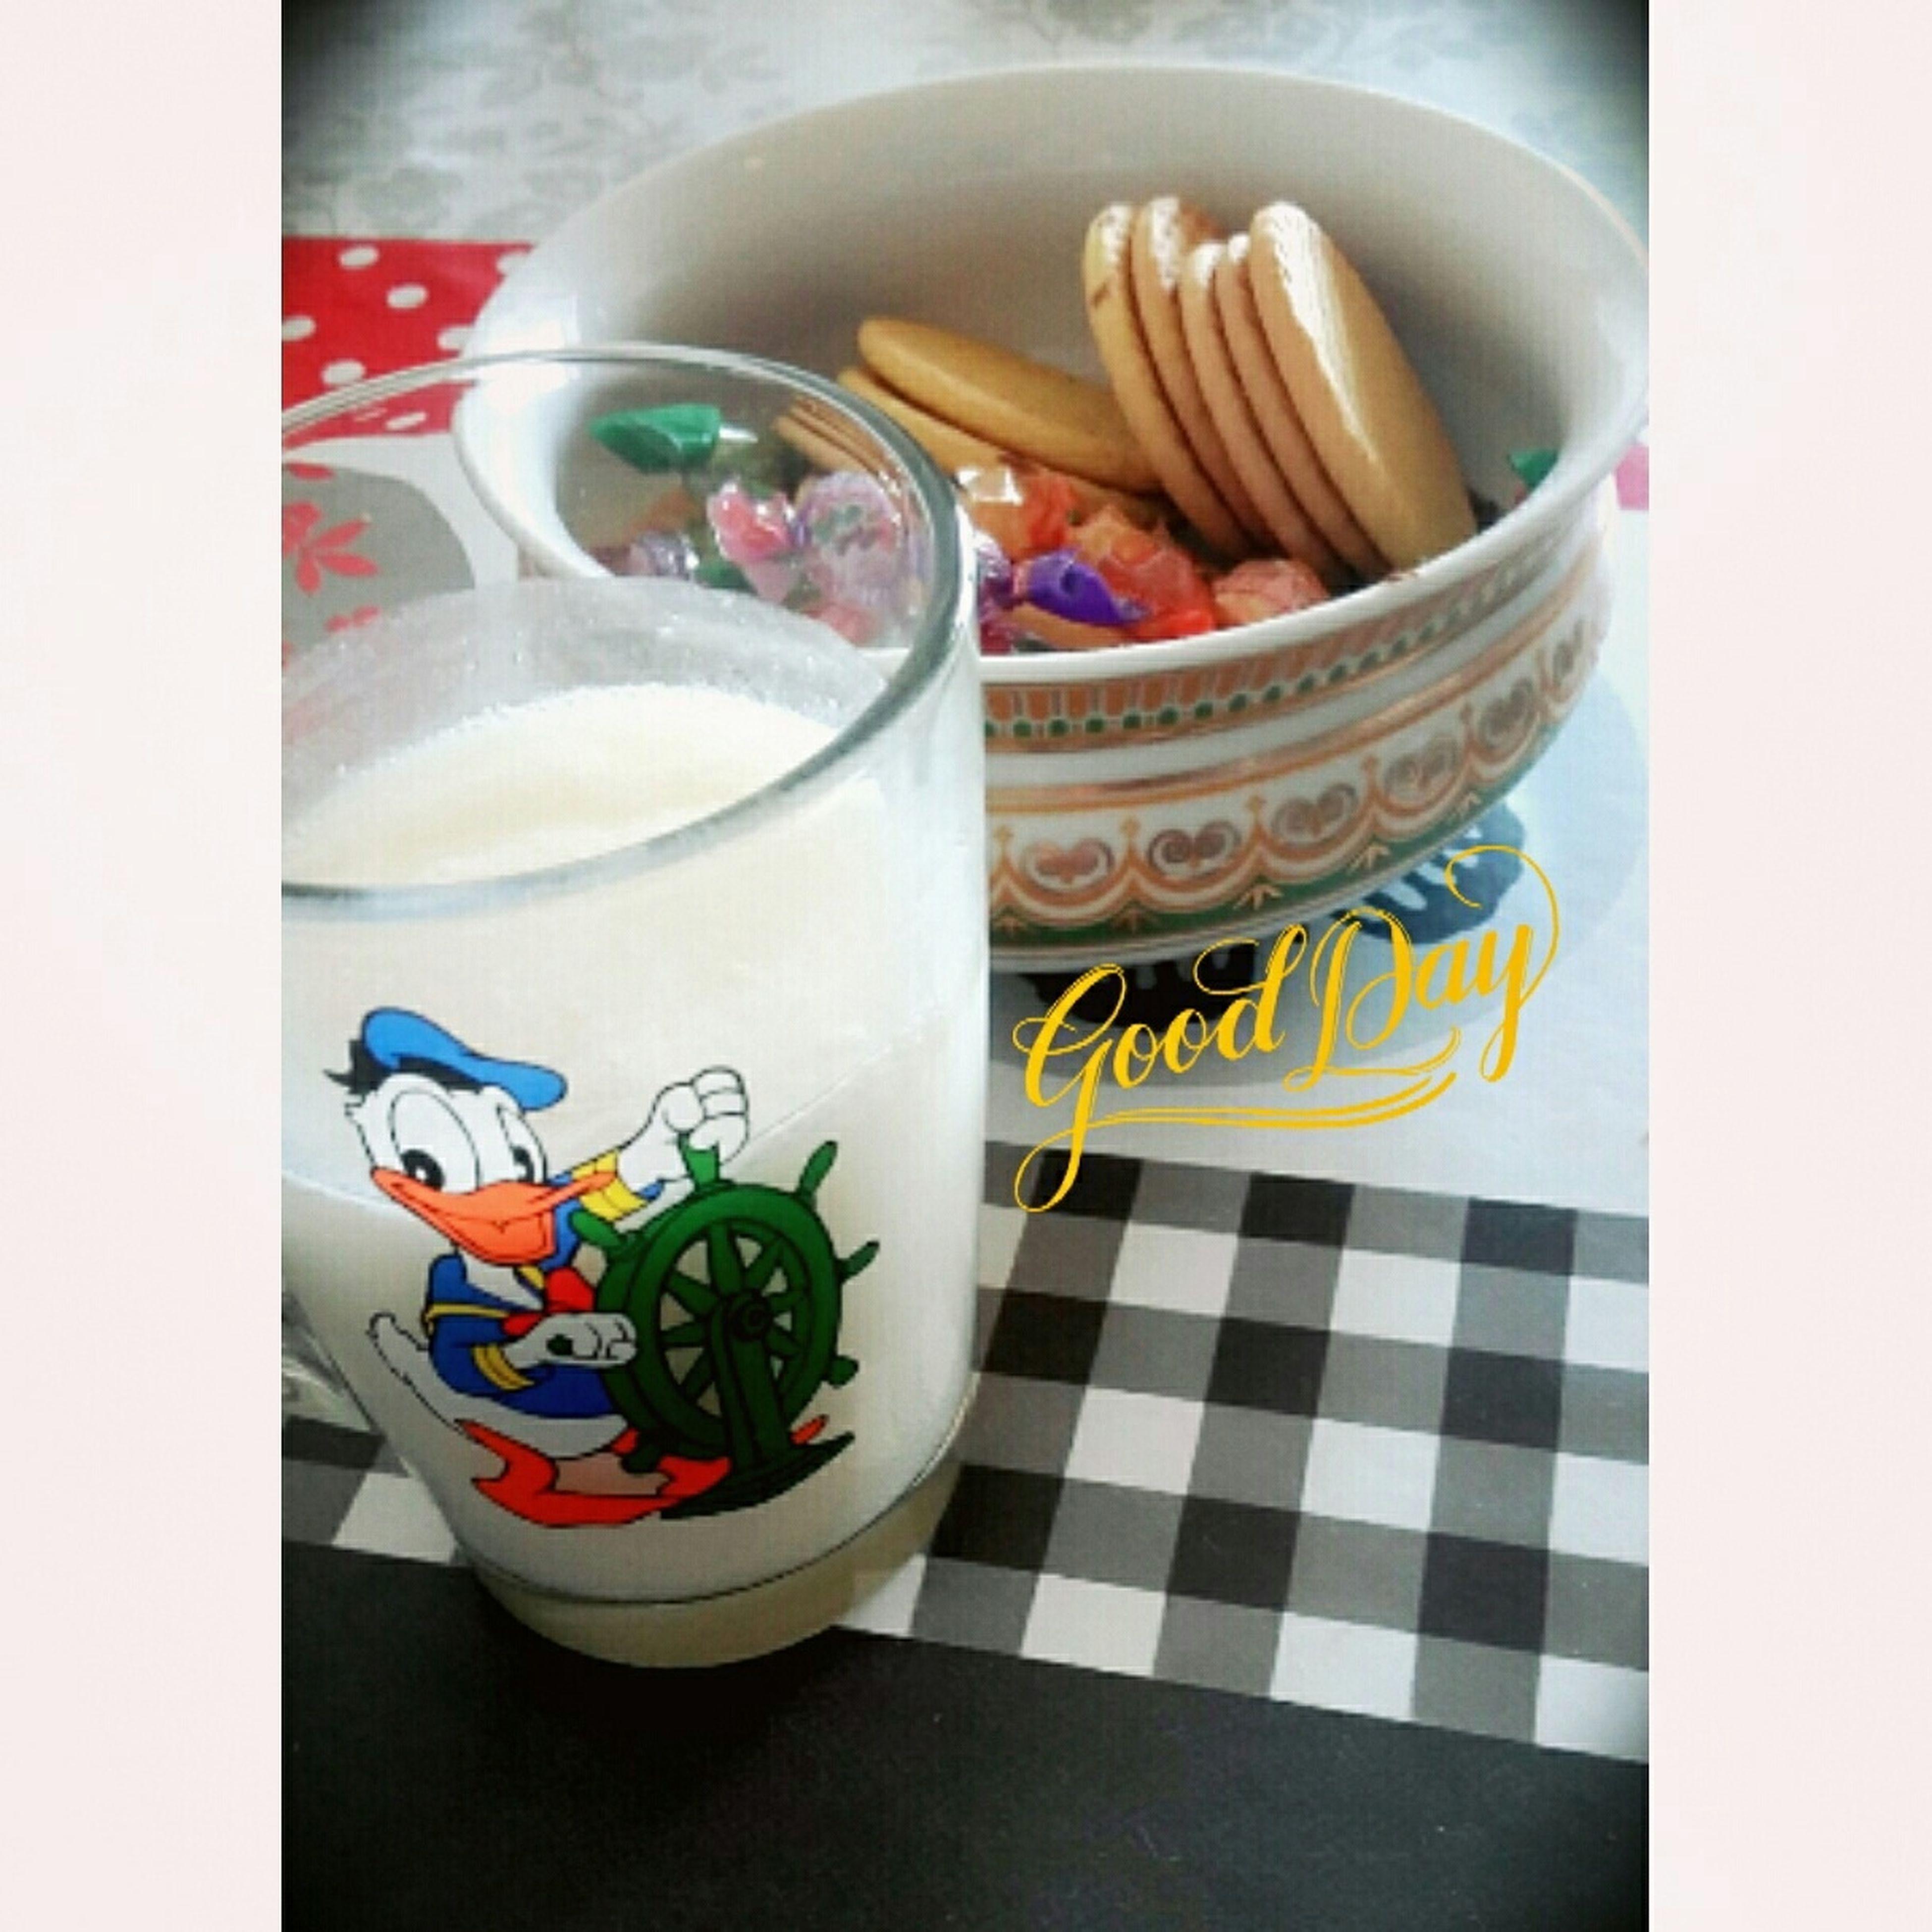 Якутский напиток ☺👍 бырпах якутский Goodday летний напиток Fresh 2015